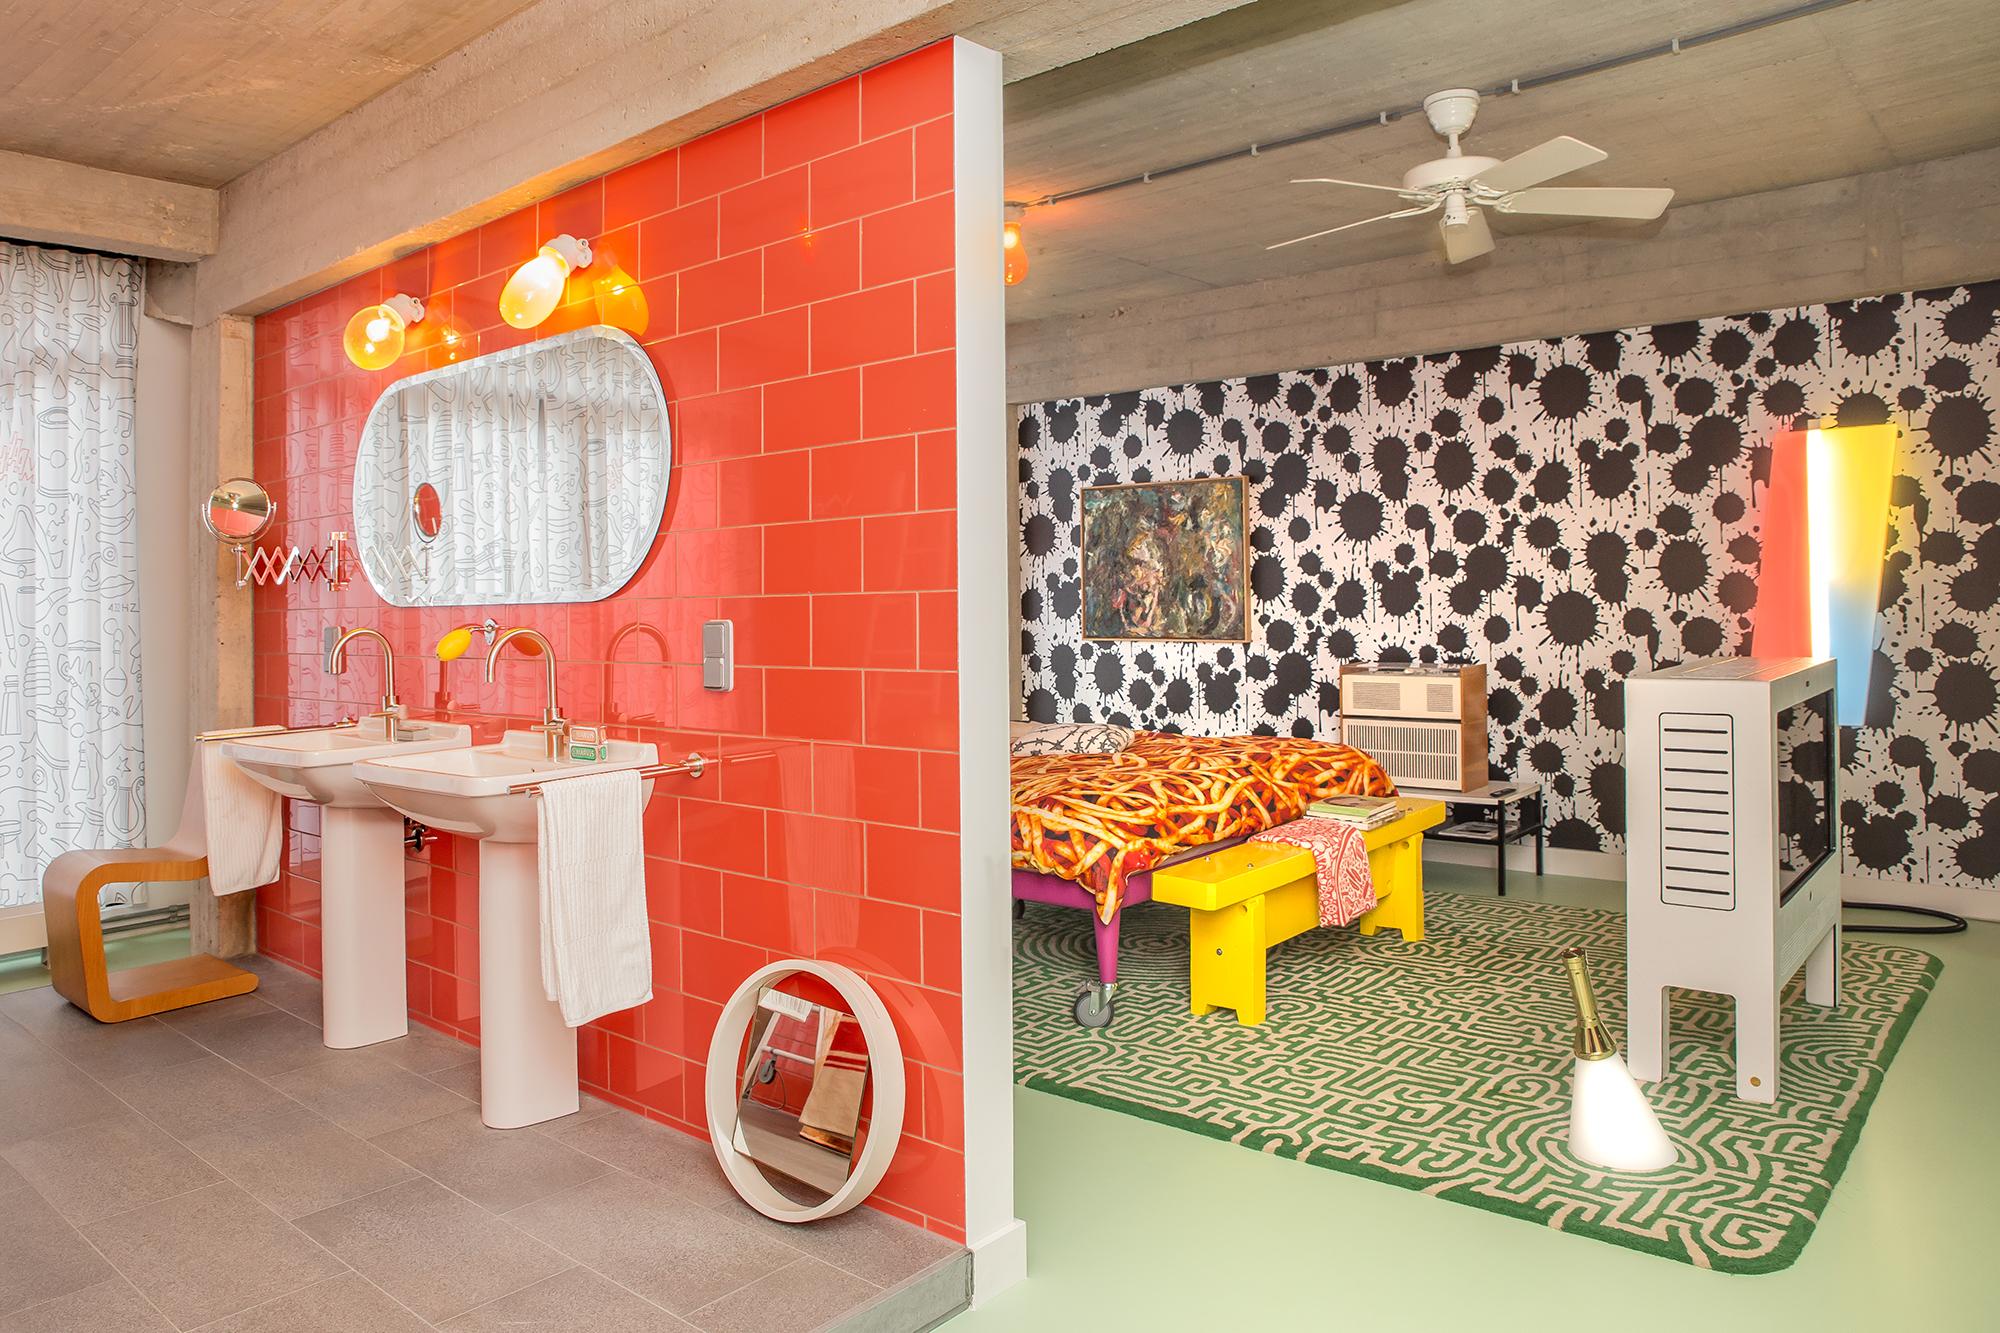 StudioJob-HQ-Bathroom_Bedroom